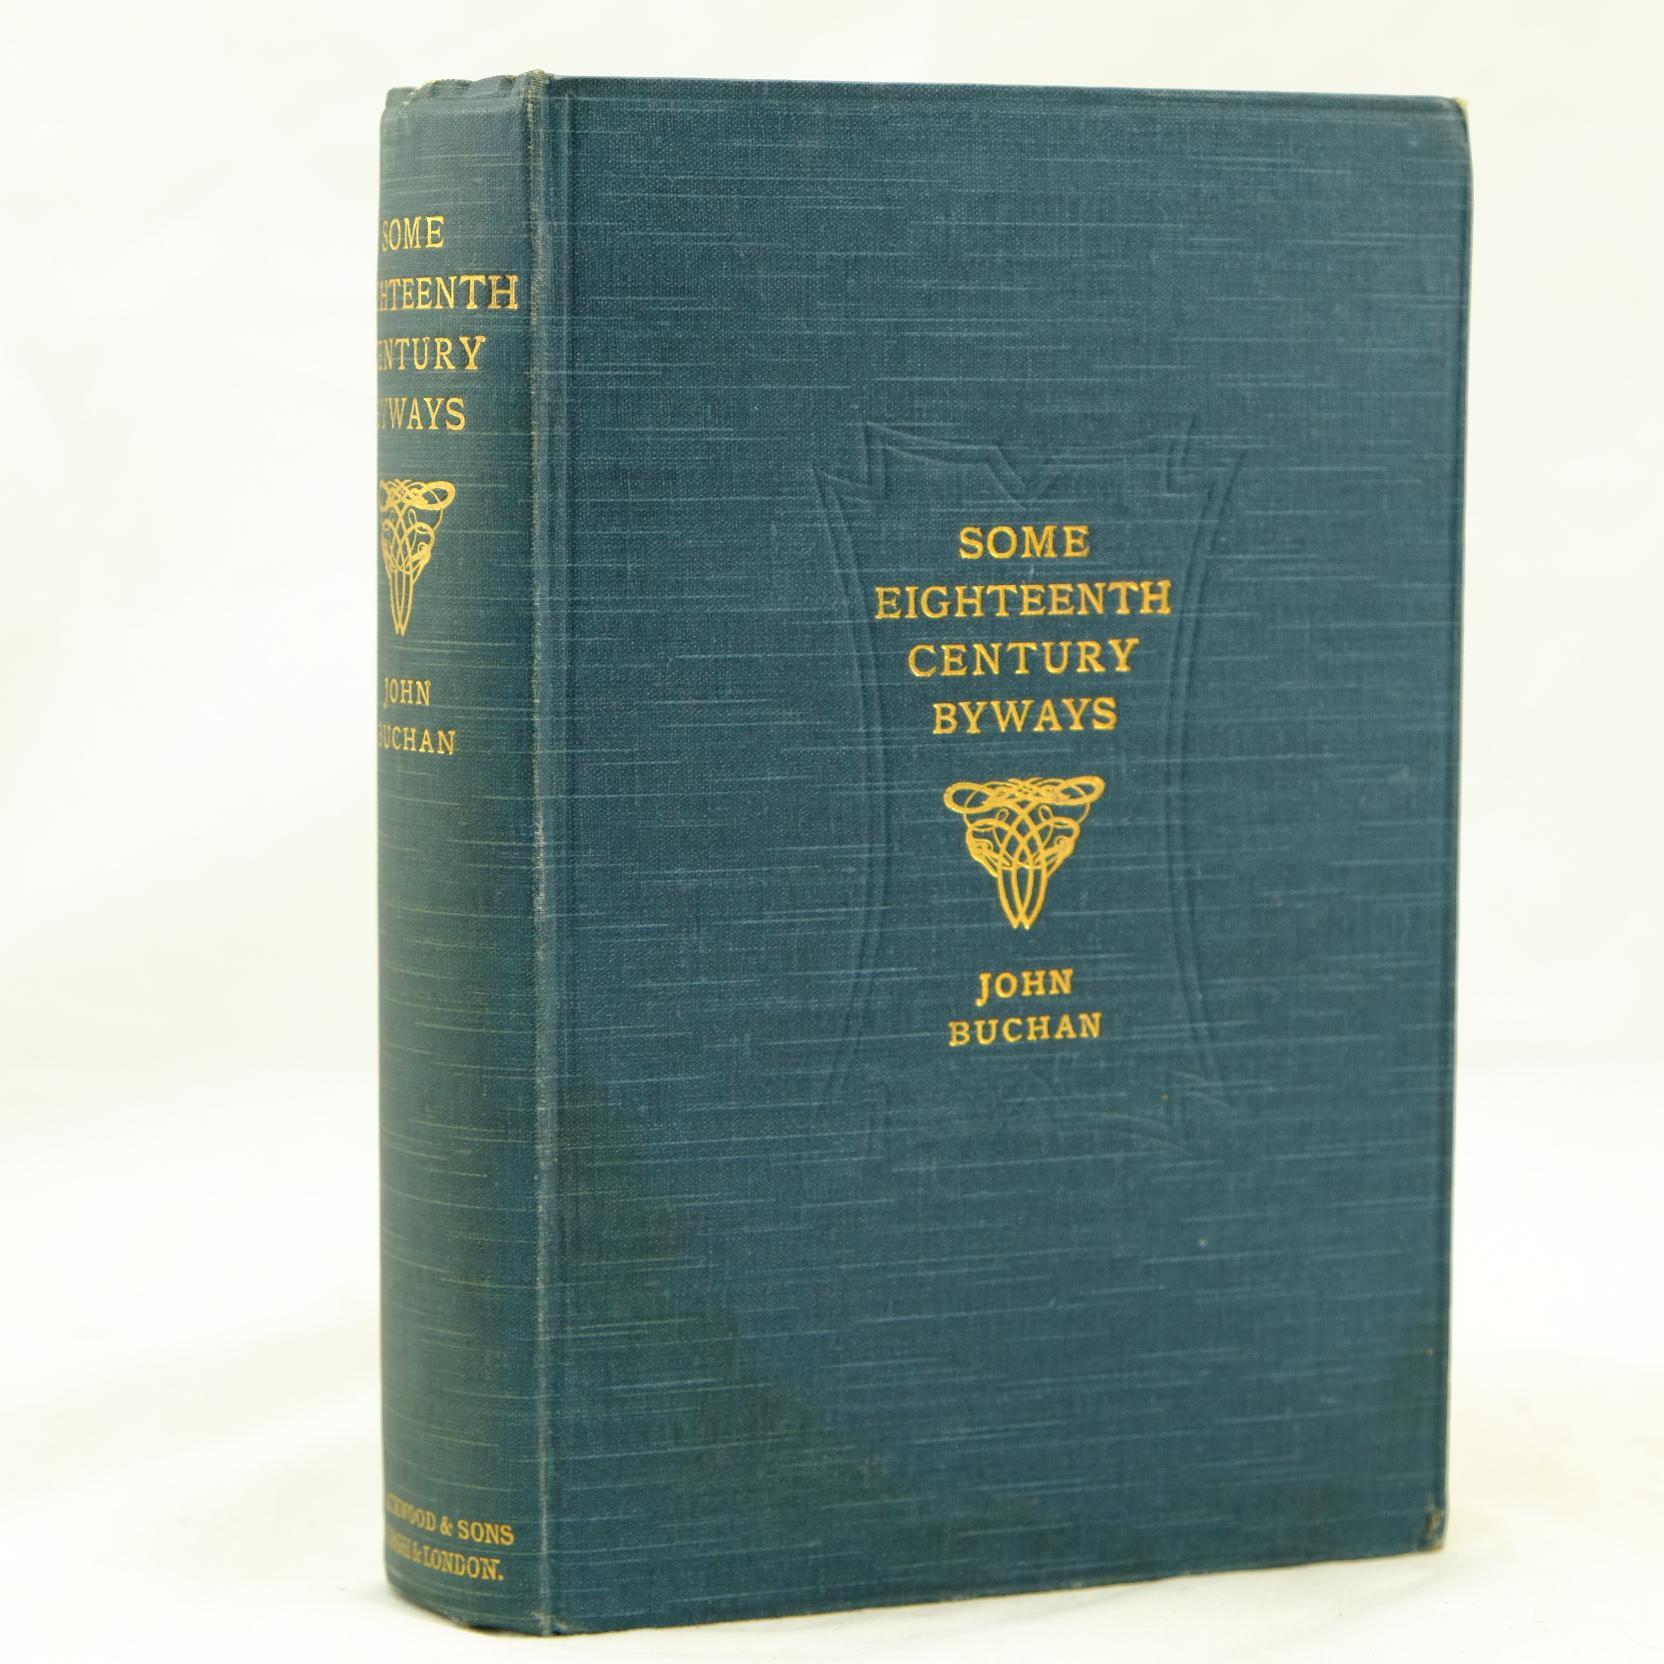 Some Eighteenth Century Byways by John Buchan